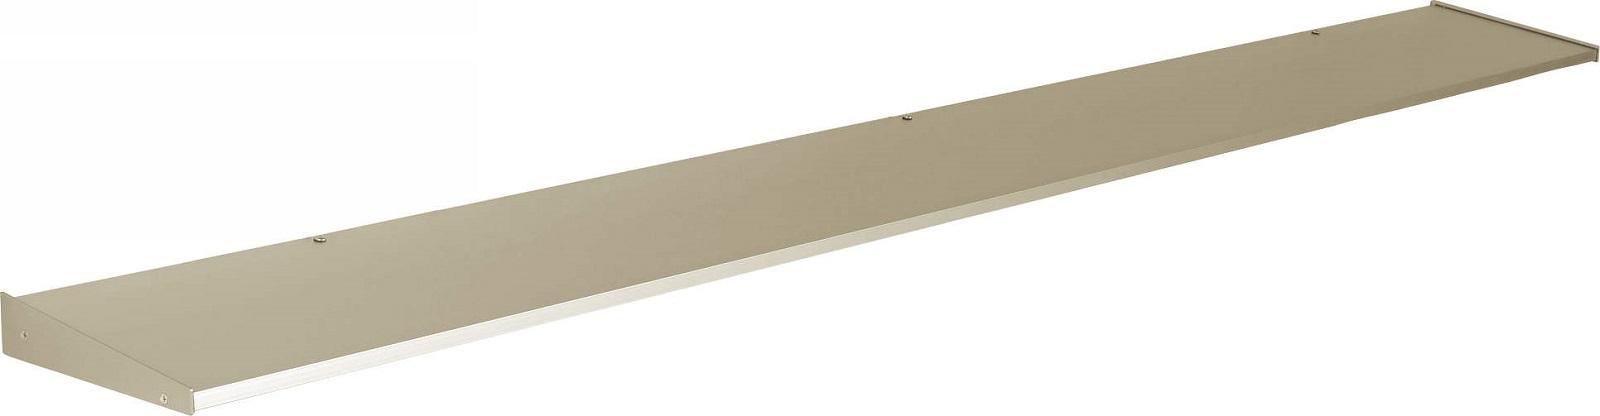 YKKAP窓まわり ひさし コンバイザー モダンスタイル 出幅200mm:先付・後付兼用[幅2720mm×高35mm]